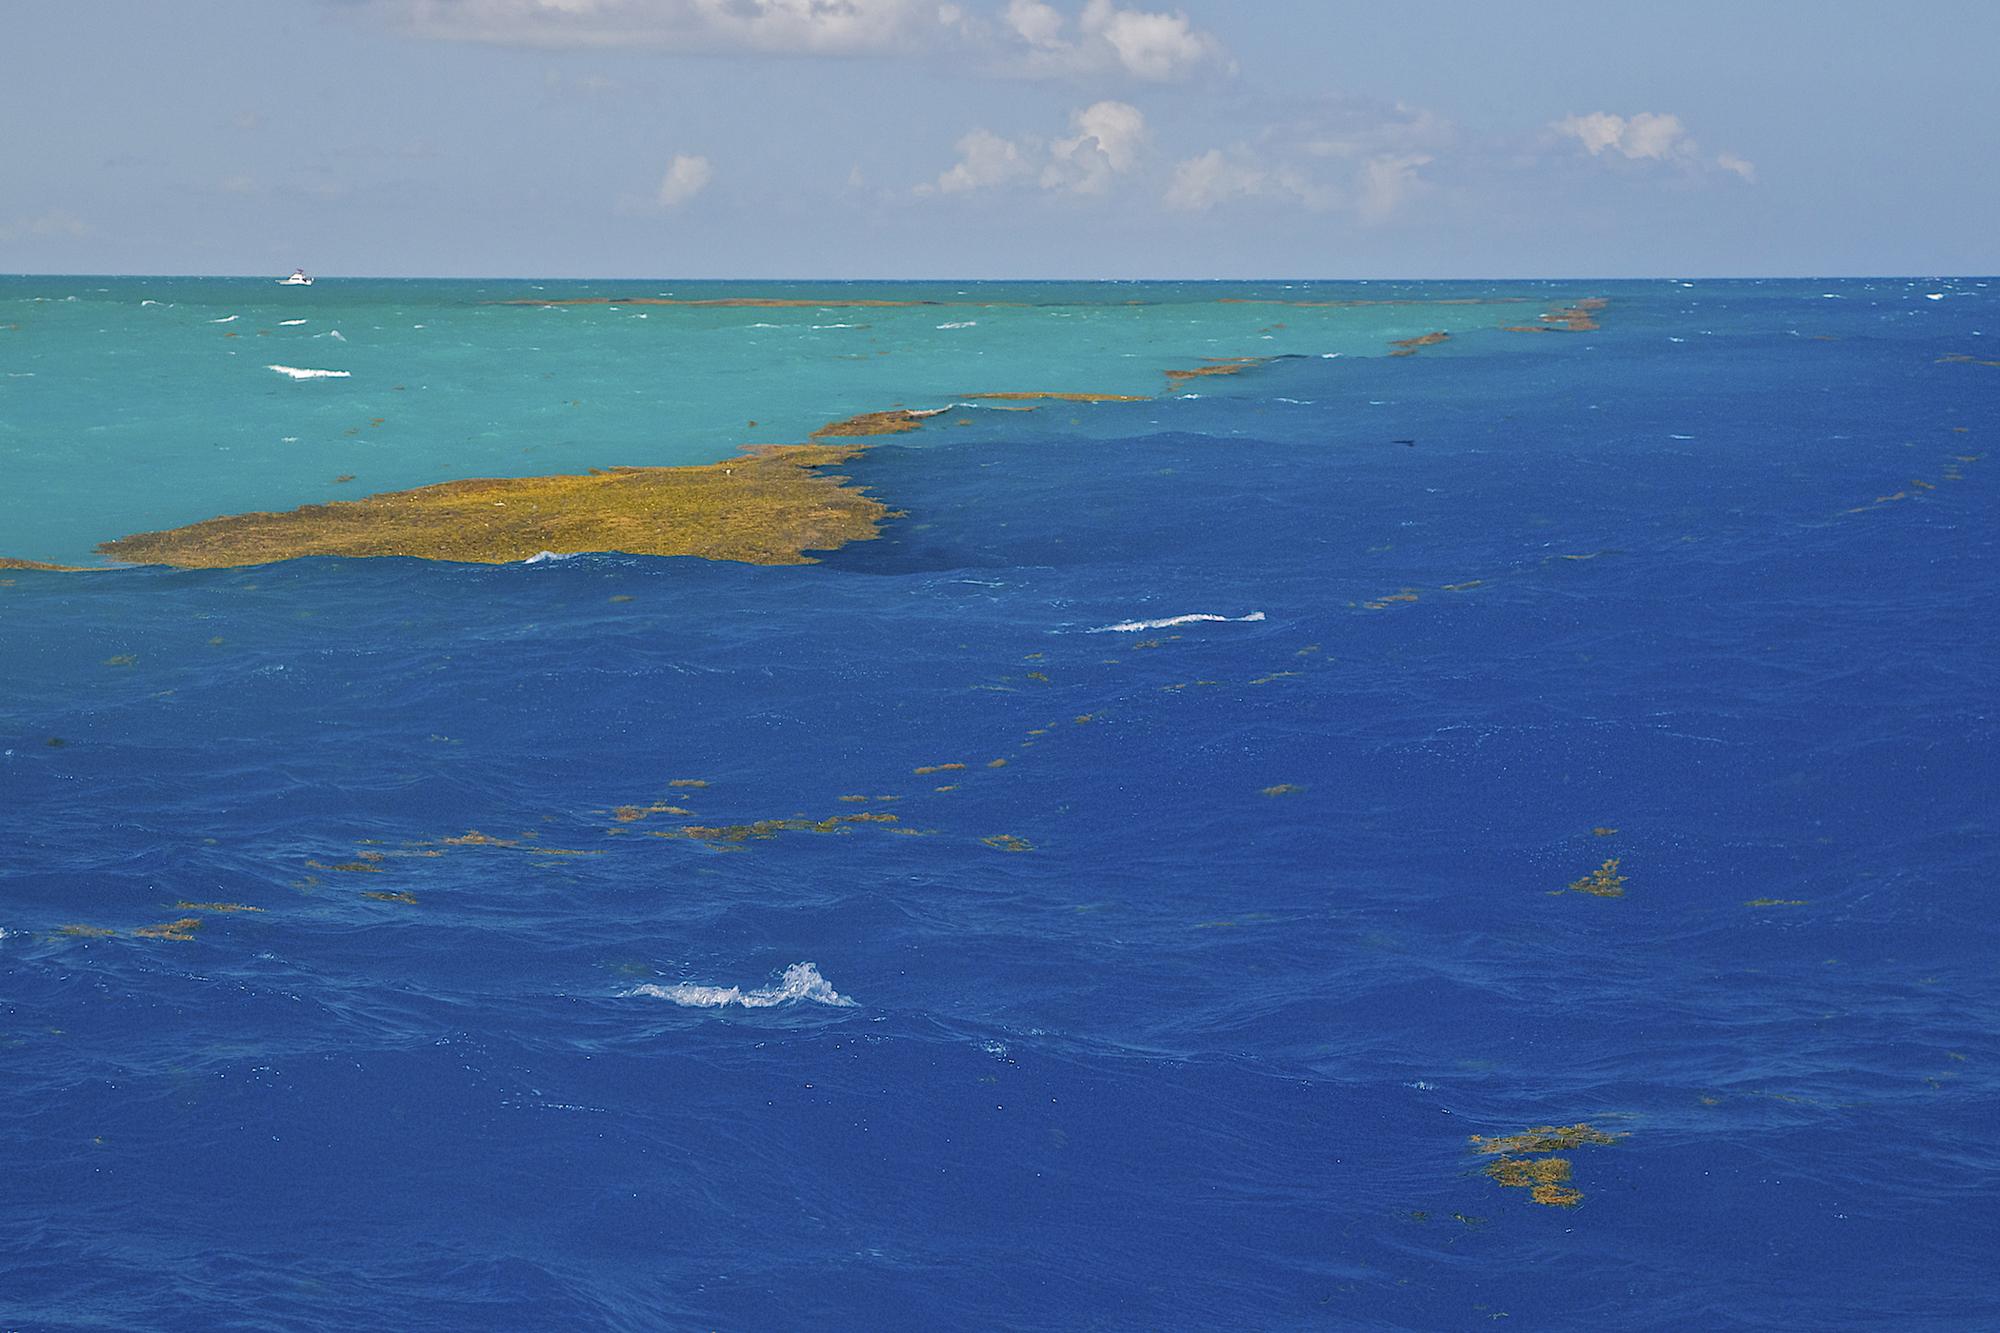 saragososeagulfstreamwaterfla.jpg